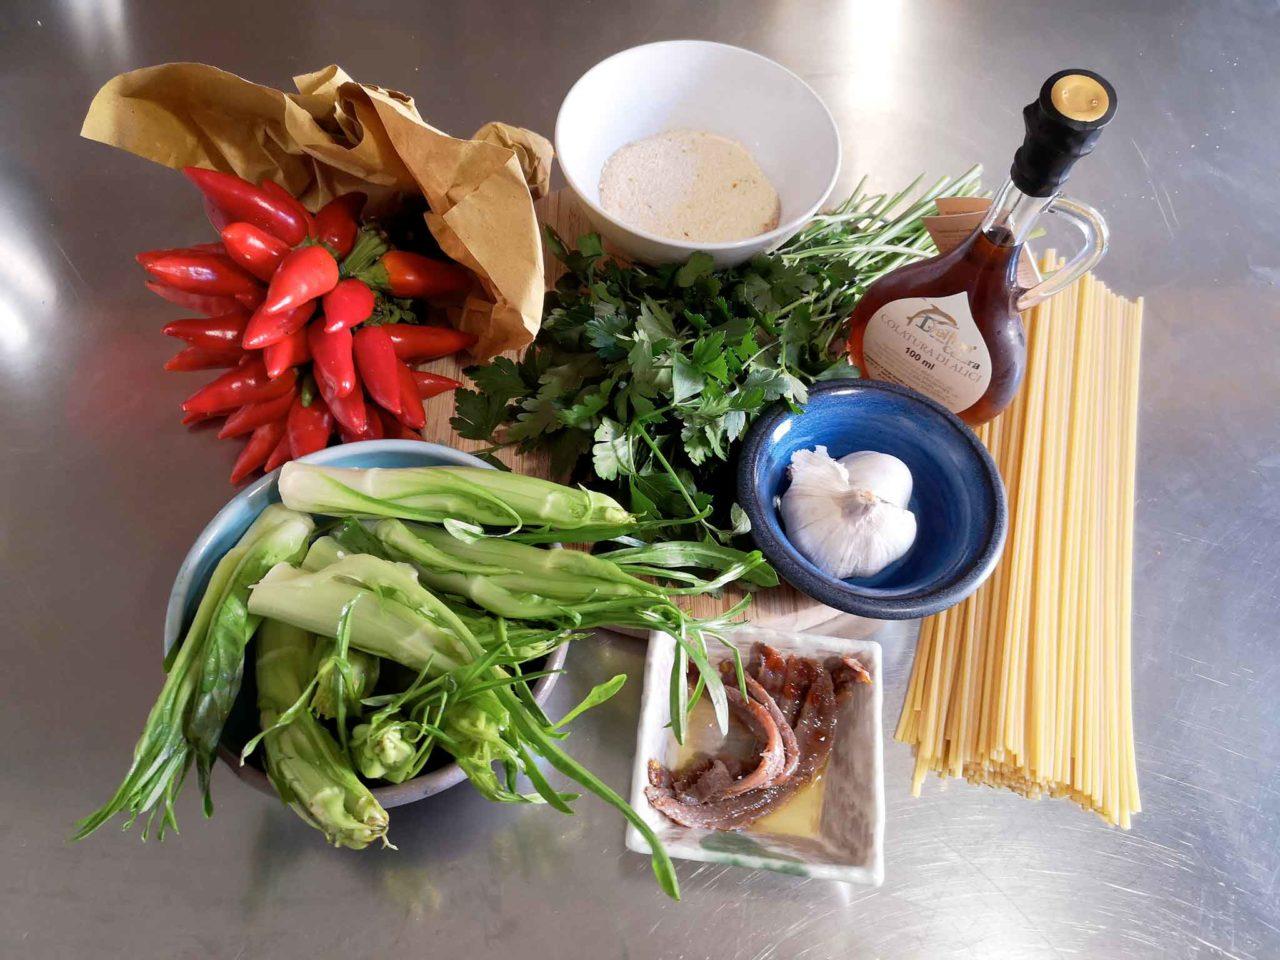 spaghetti aglio olio peperoncino puntarelle ingredienti